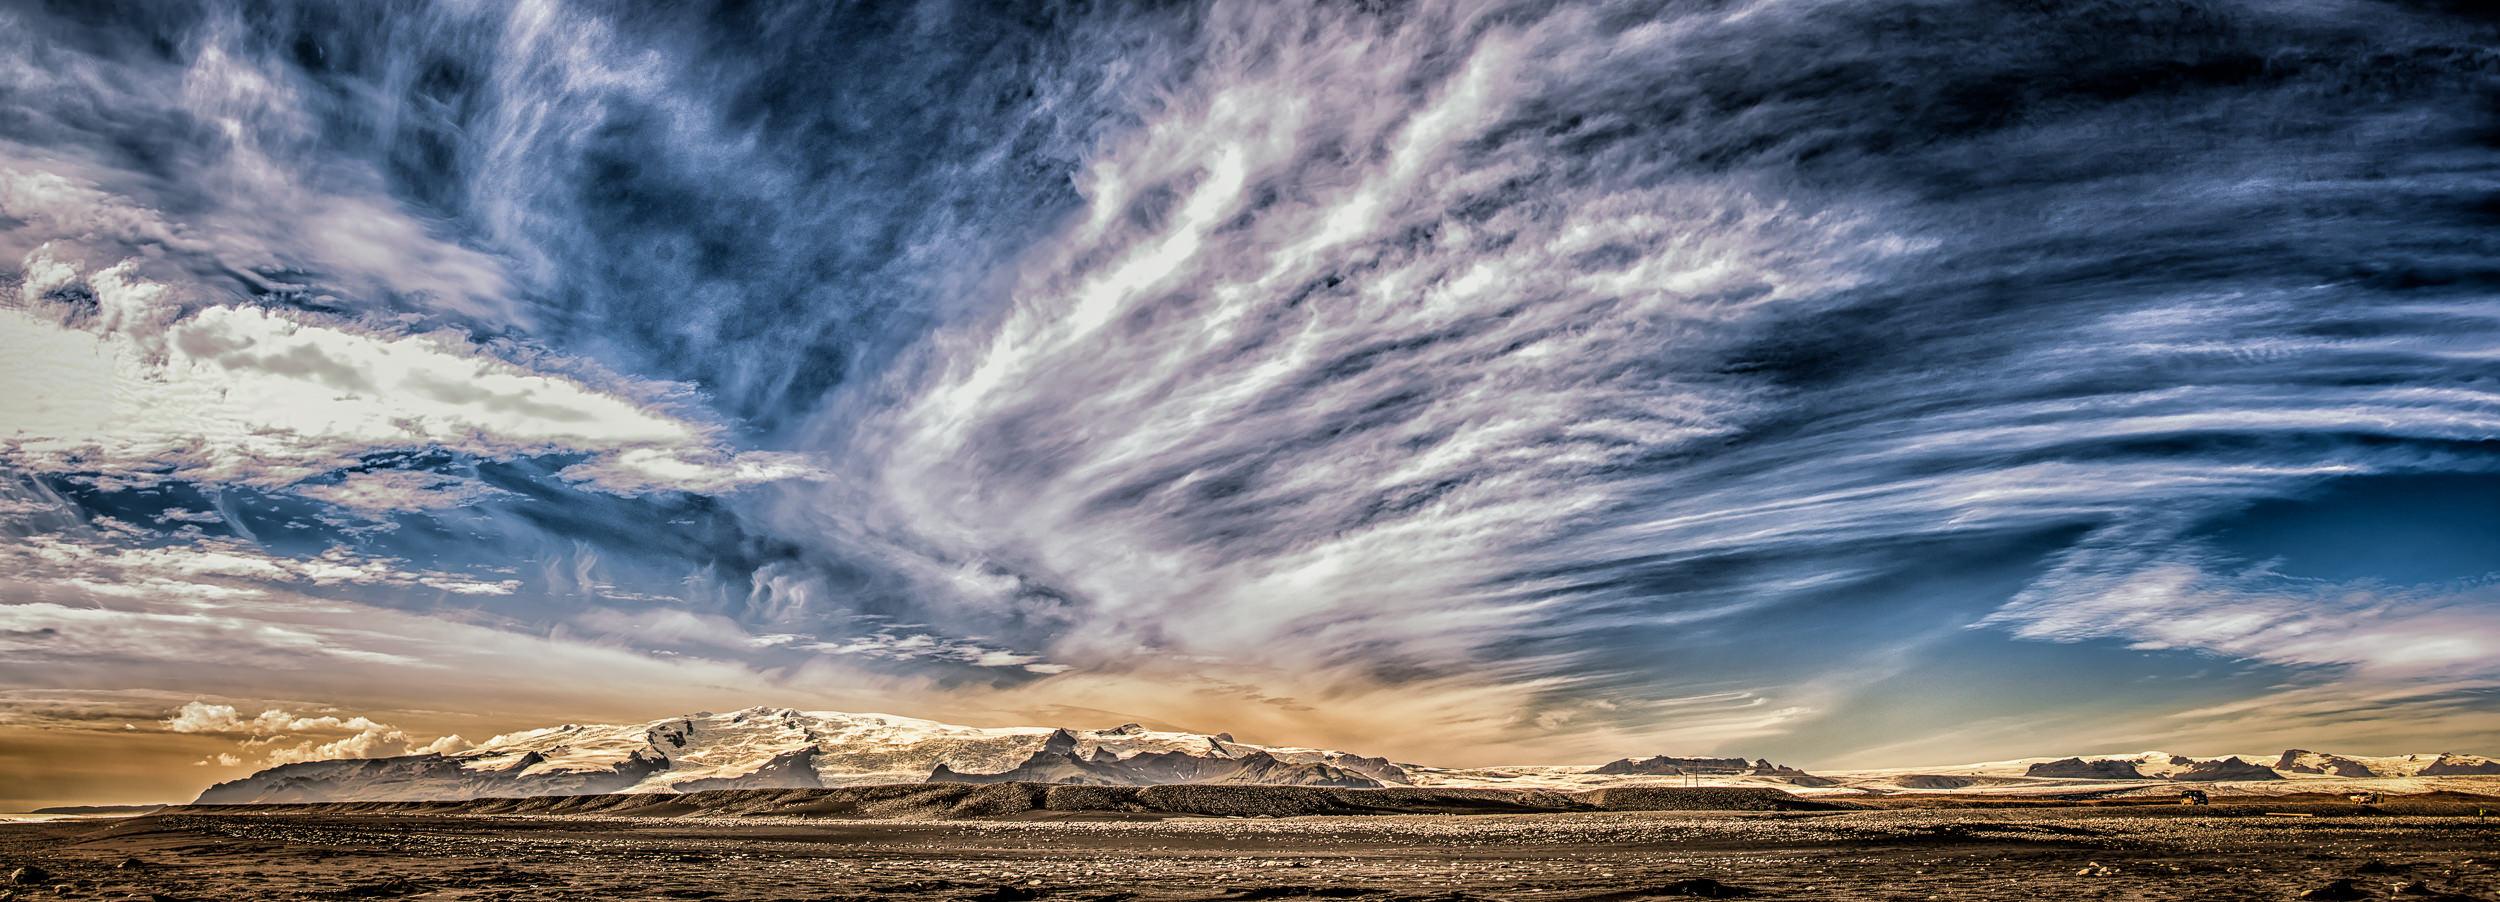 [2012 08 12] Iceland Vatnajokul Glacier NIKON D800 (1760)- pano Edit-Edit-Edit.jpg